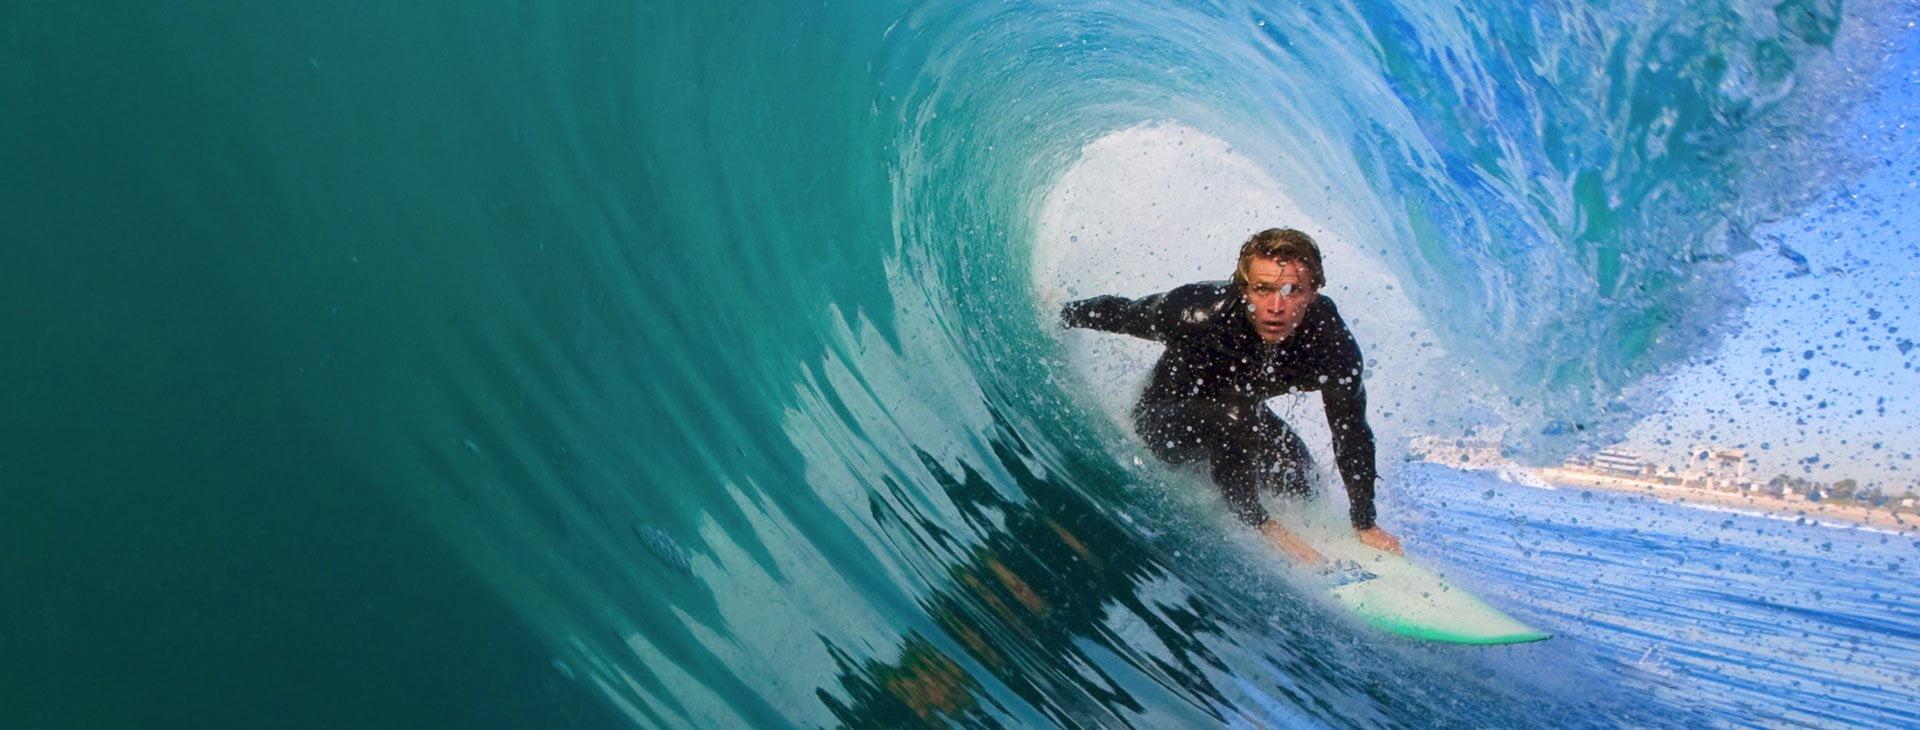 Surfer using Sunsafe Rx